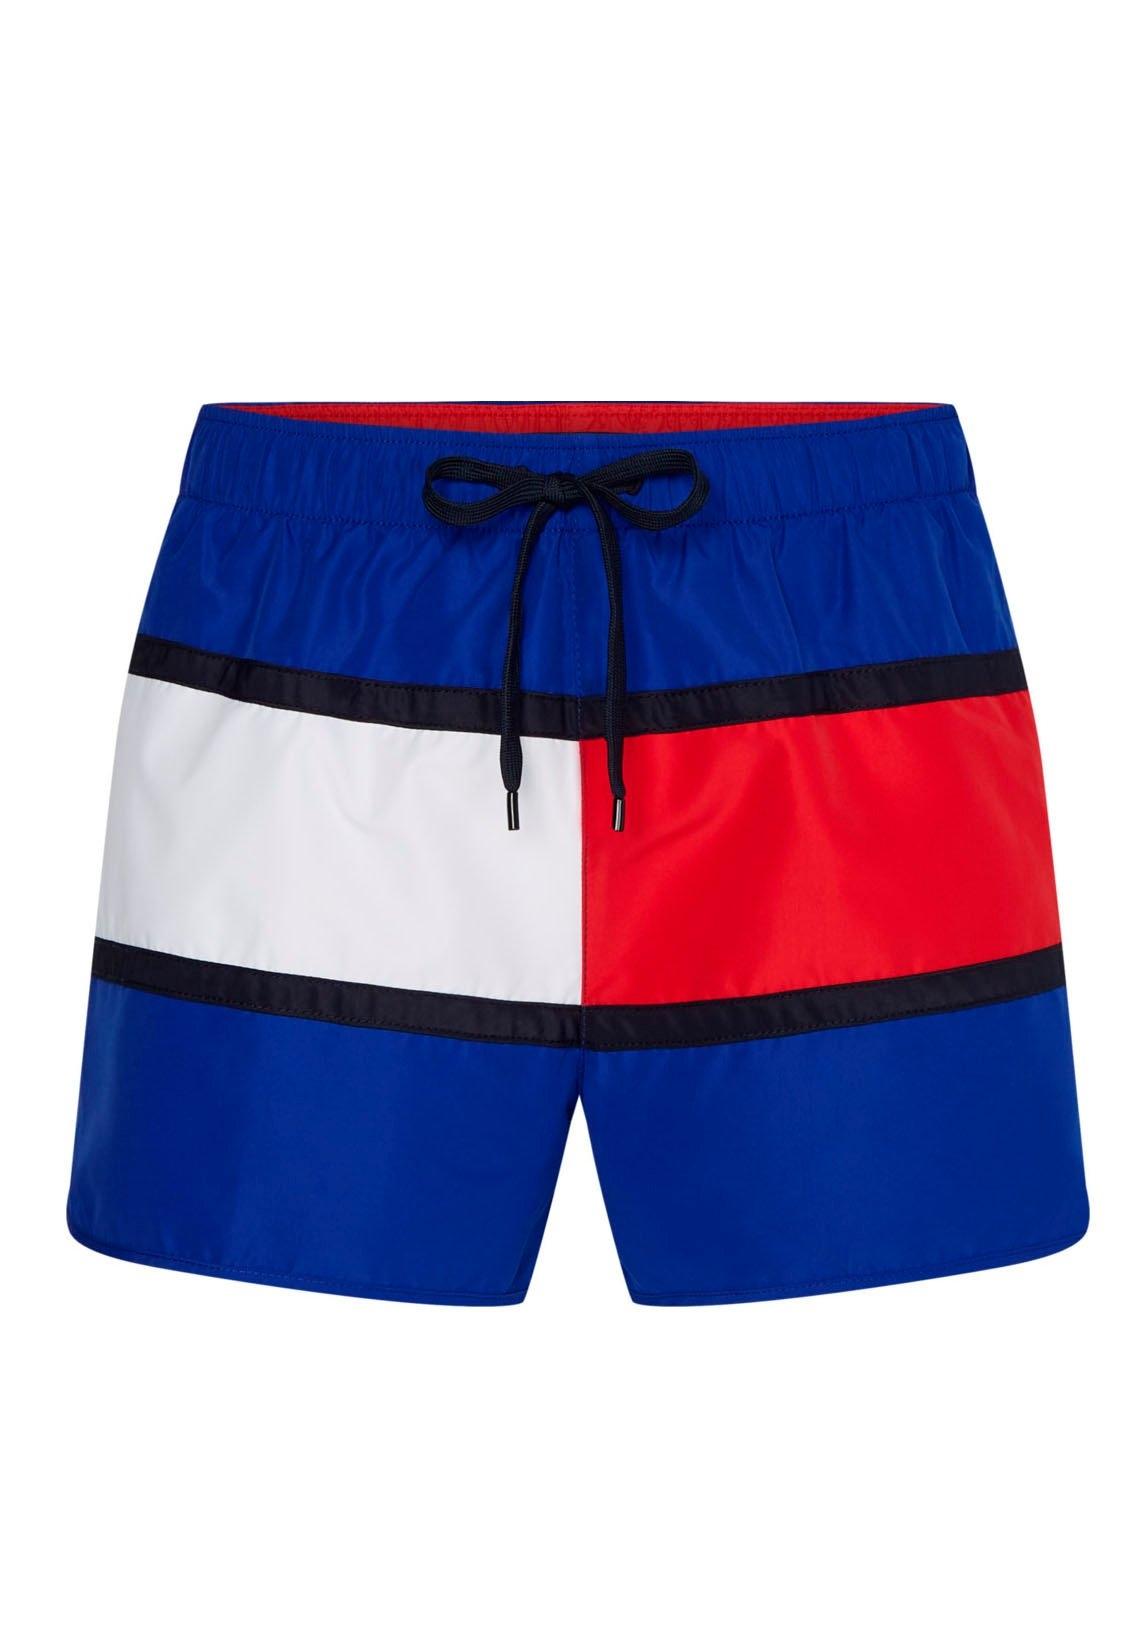 Tommy Hilfiger zwemshort in tommy hilfiger-kleuren bij Lascana online kopen